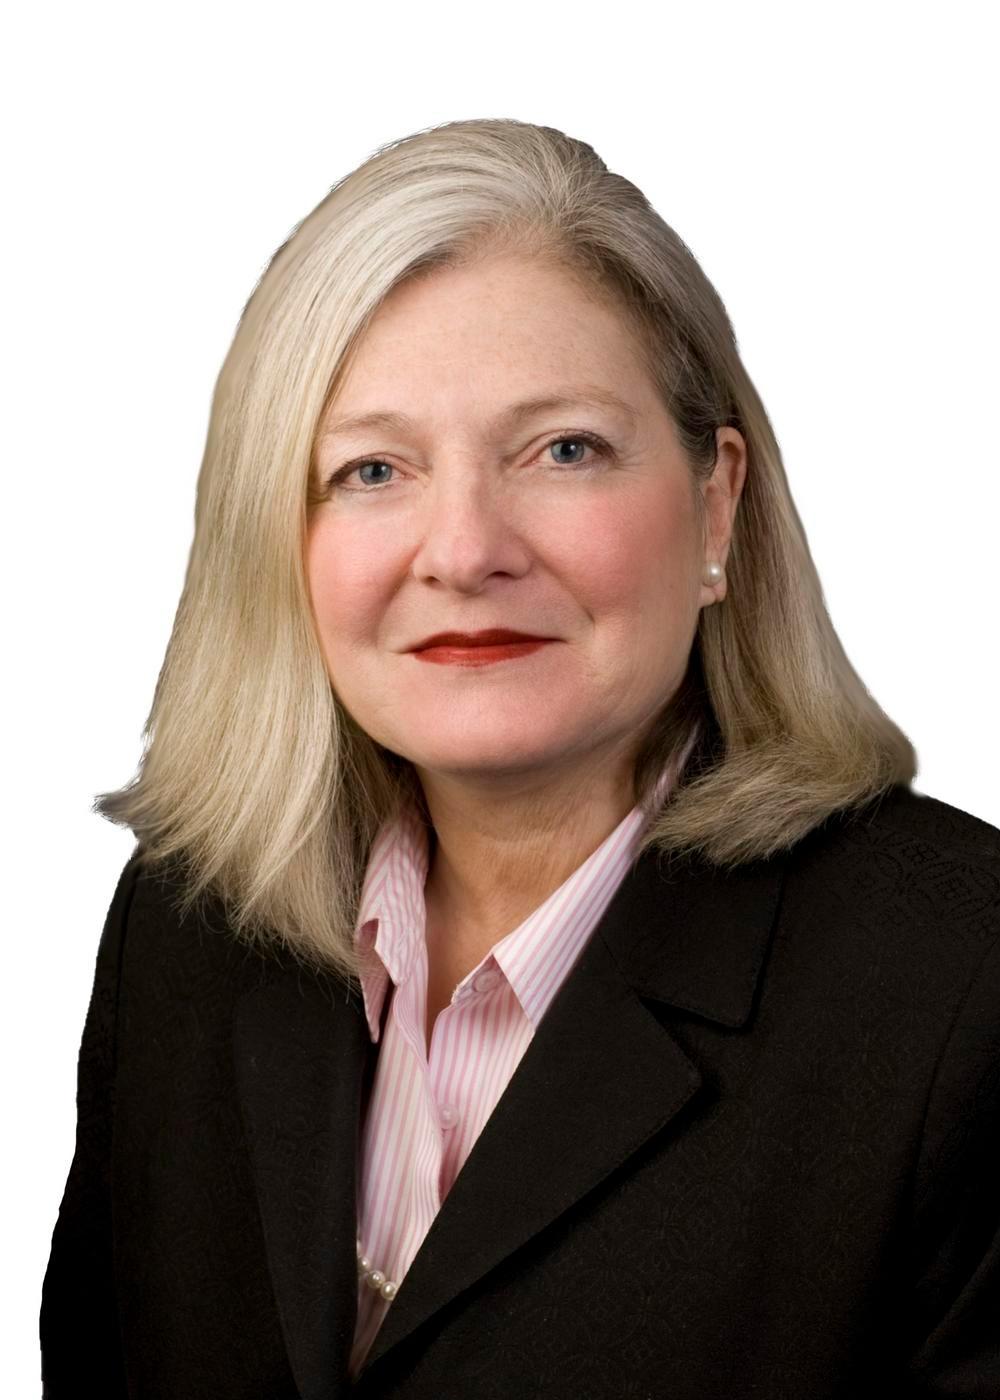 Joan Sweeney, CFP® Photo